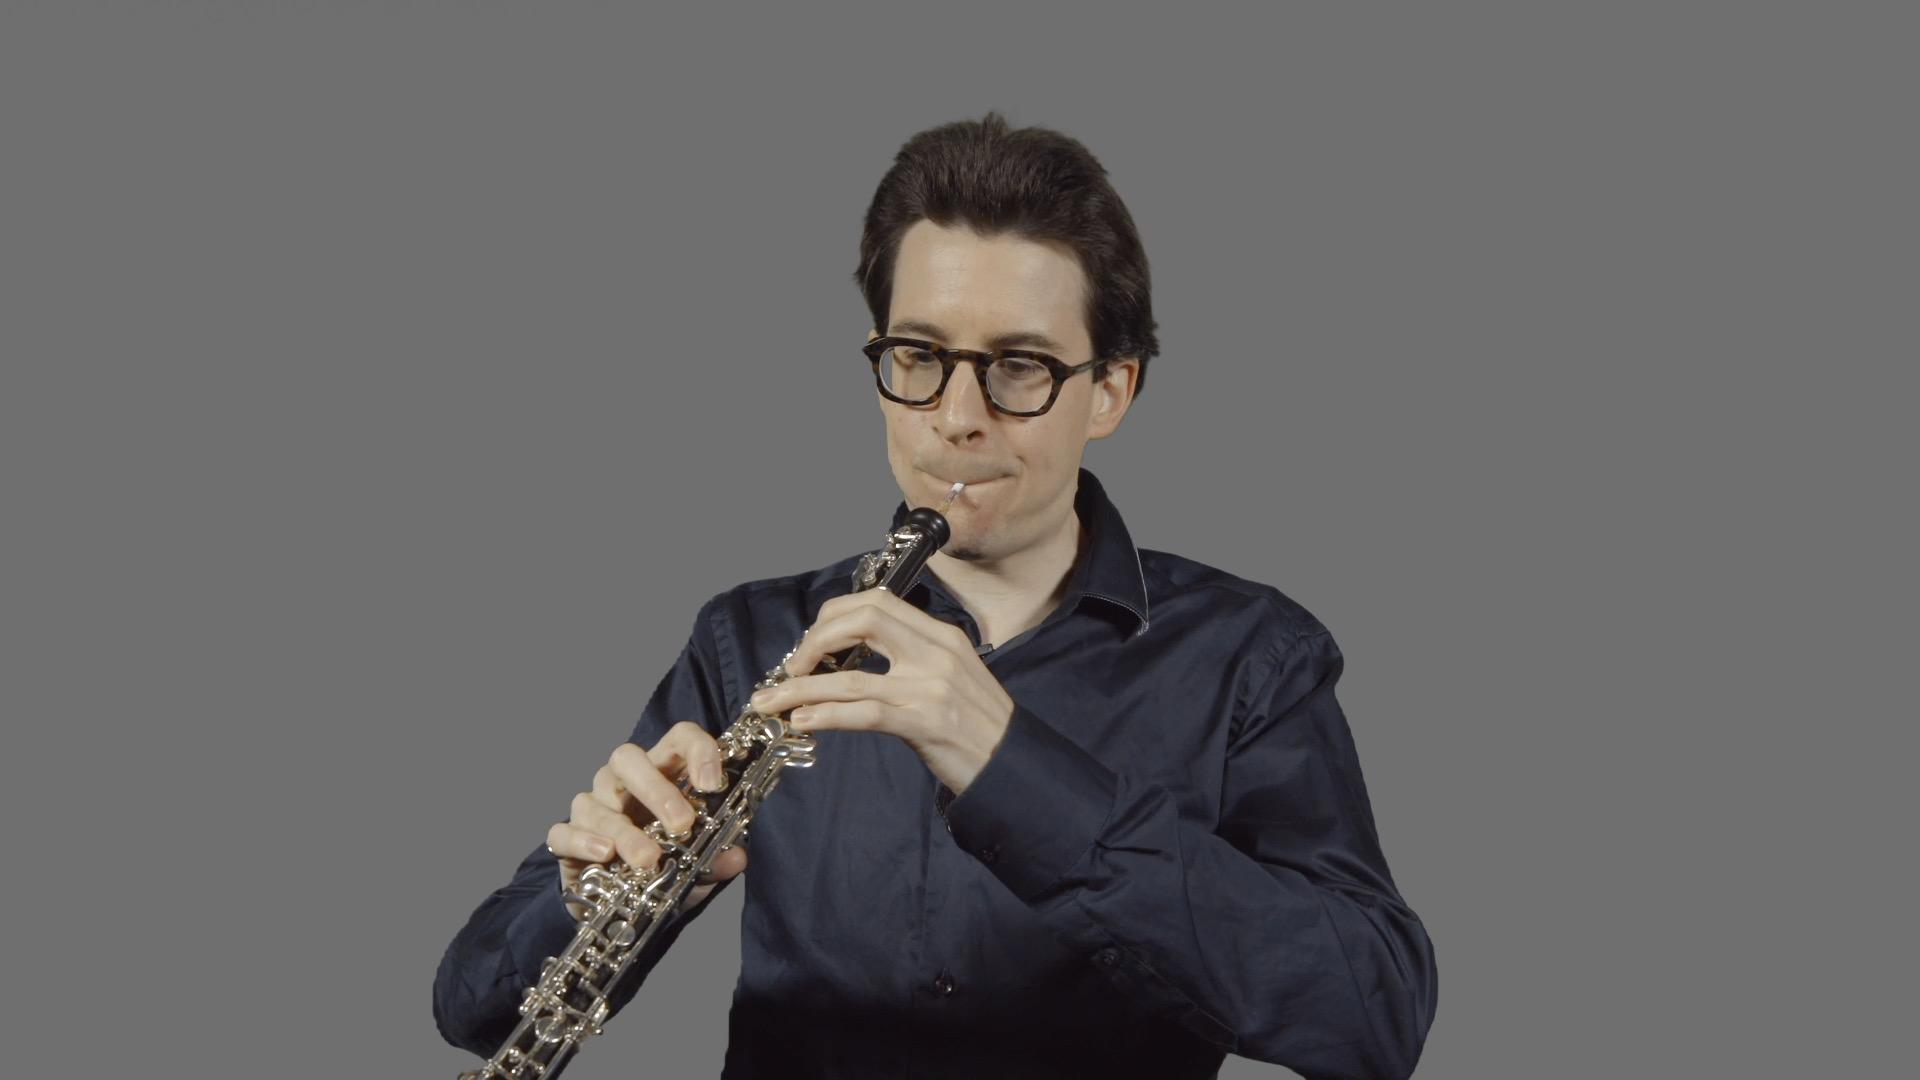 Oboe – 1. Embouchure and finger technique